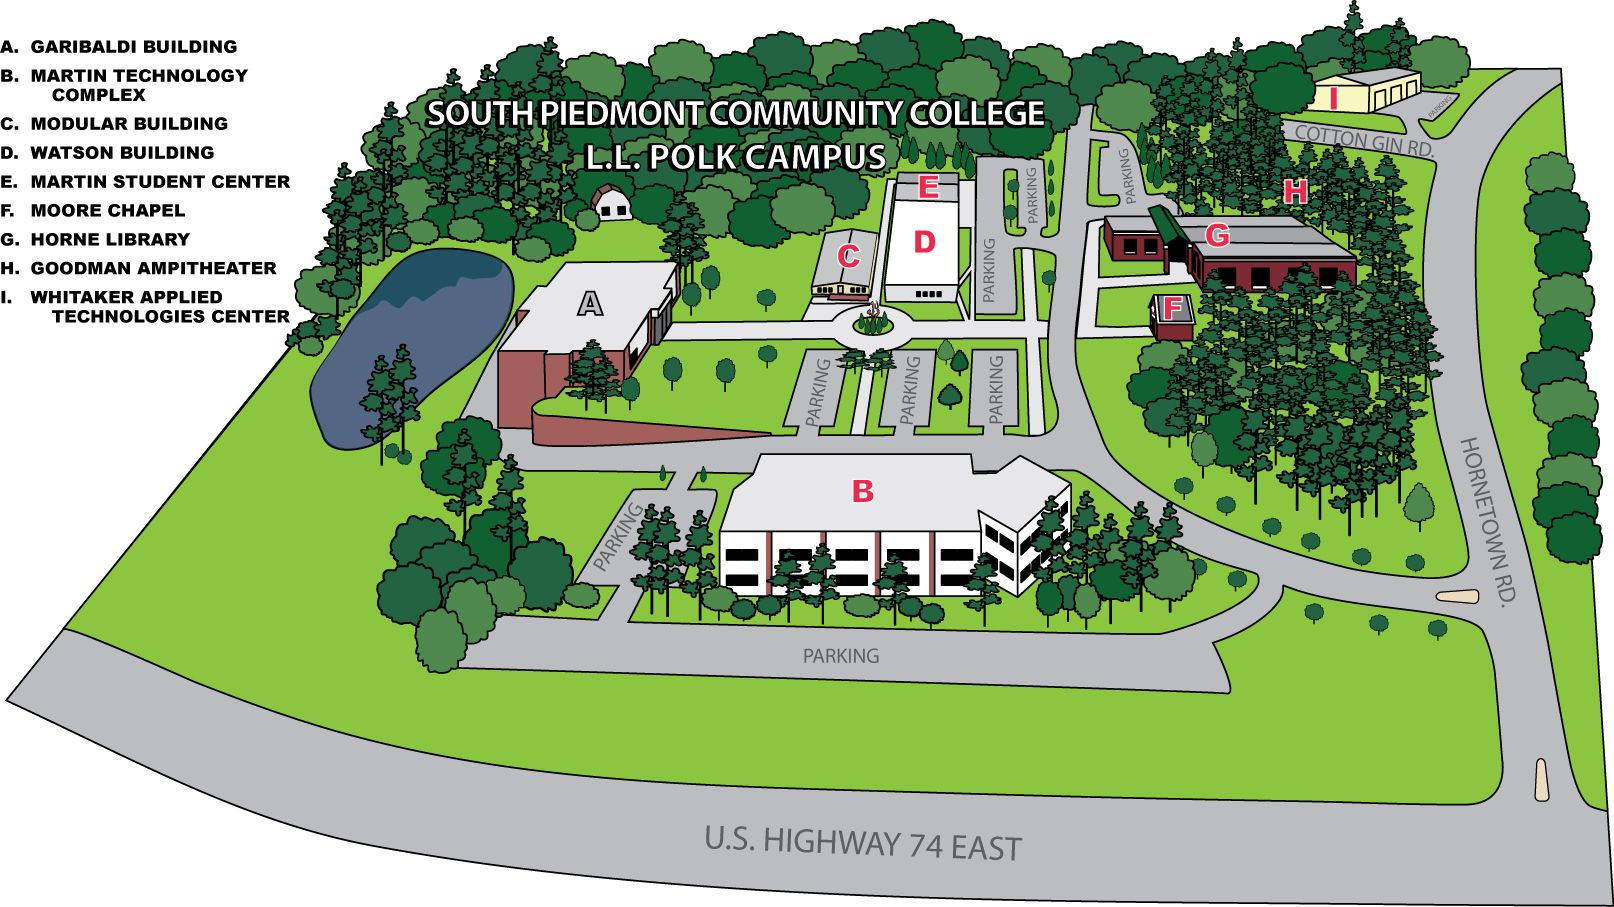 Lakeland Community College Campus Map.Lakeland College Campus Map Www Imagessure Com